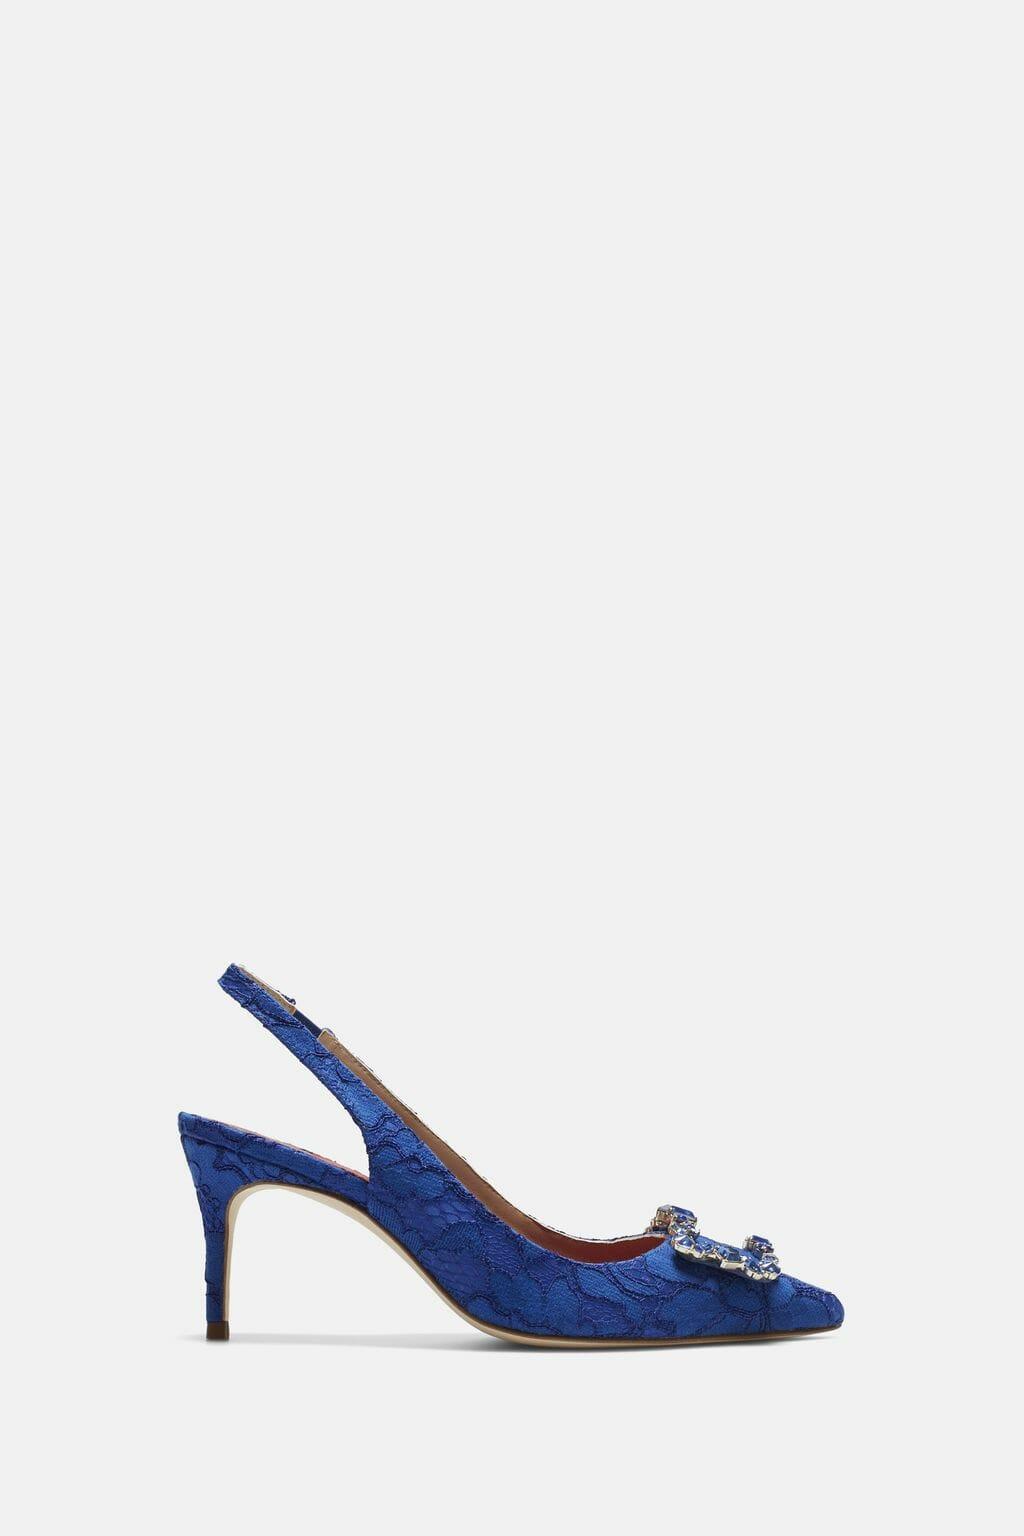 CH-Carolina-herrera-shoes-collection-Spring-Summer-2018-shoe-23